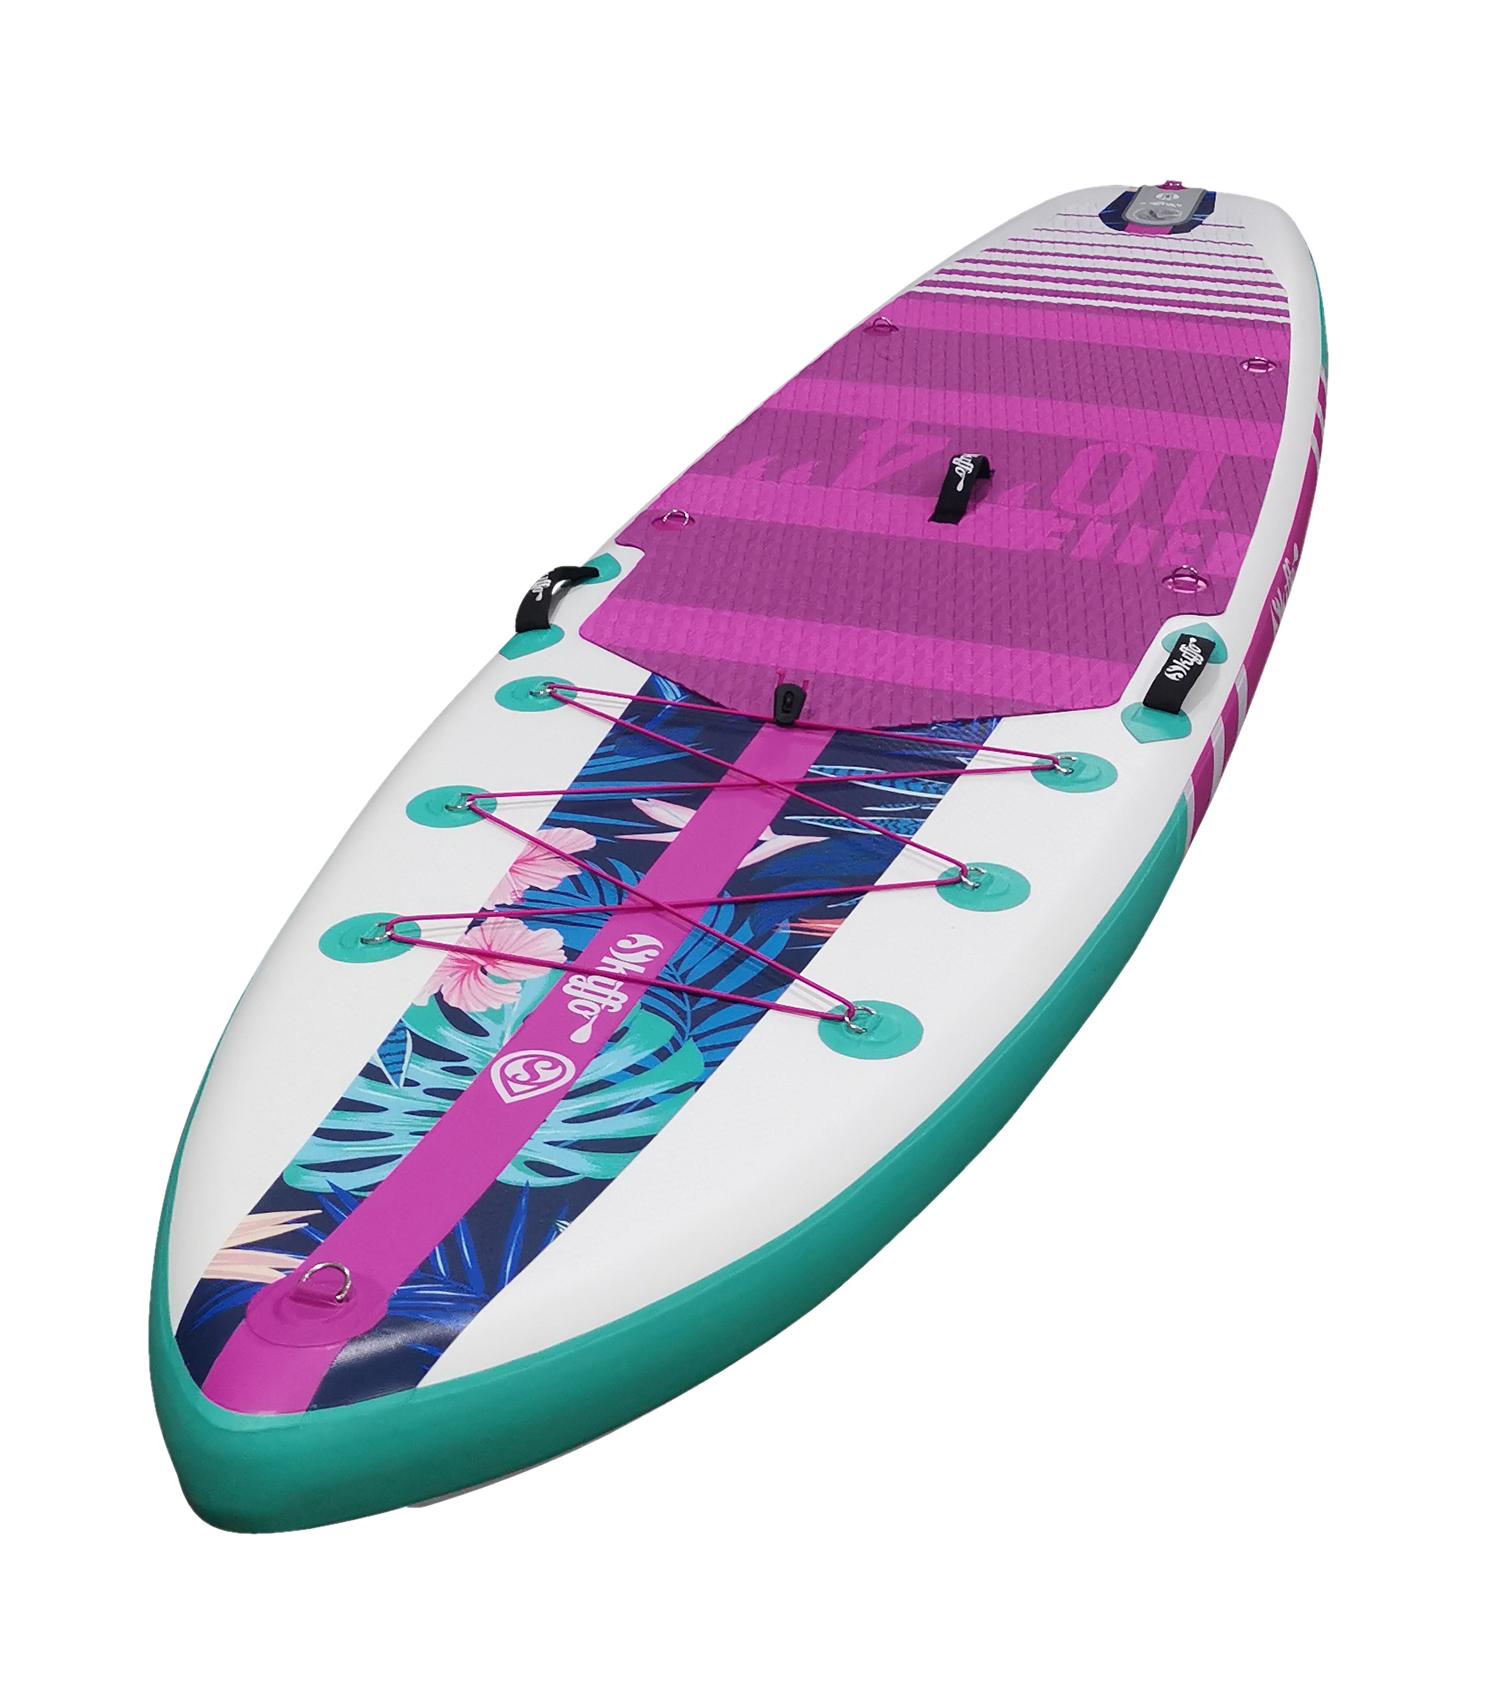 paddleboard_Skiffo_Elle_10,4_3-4.